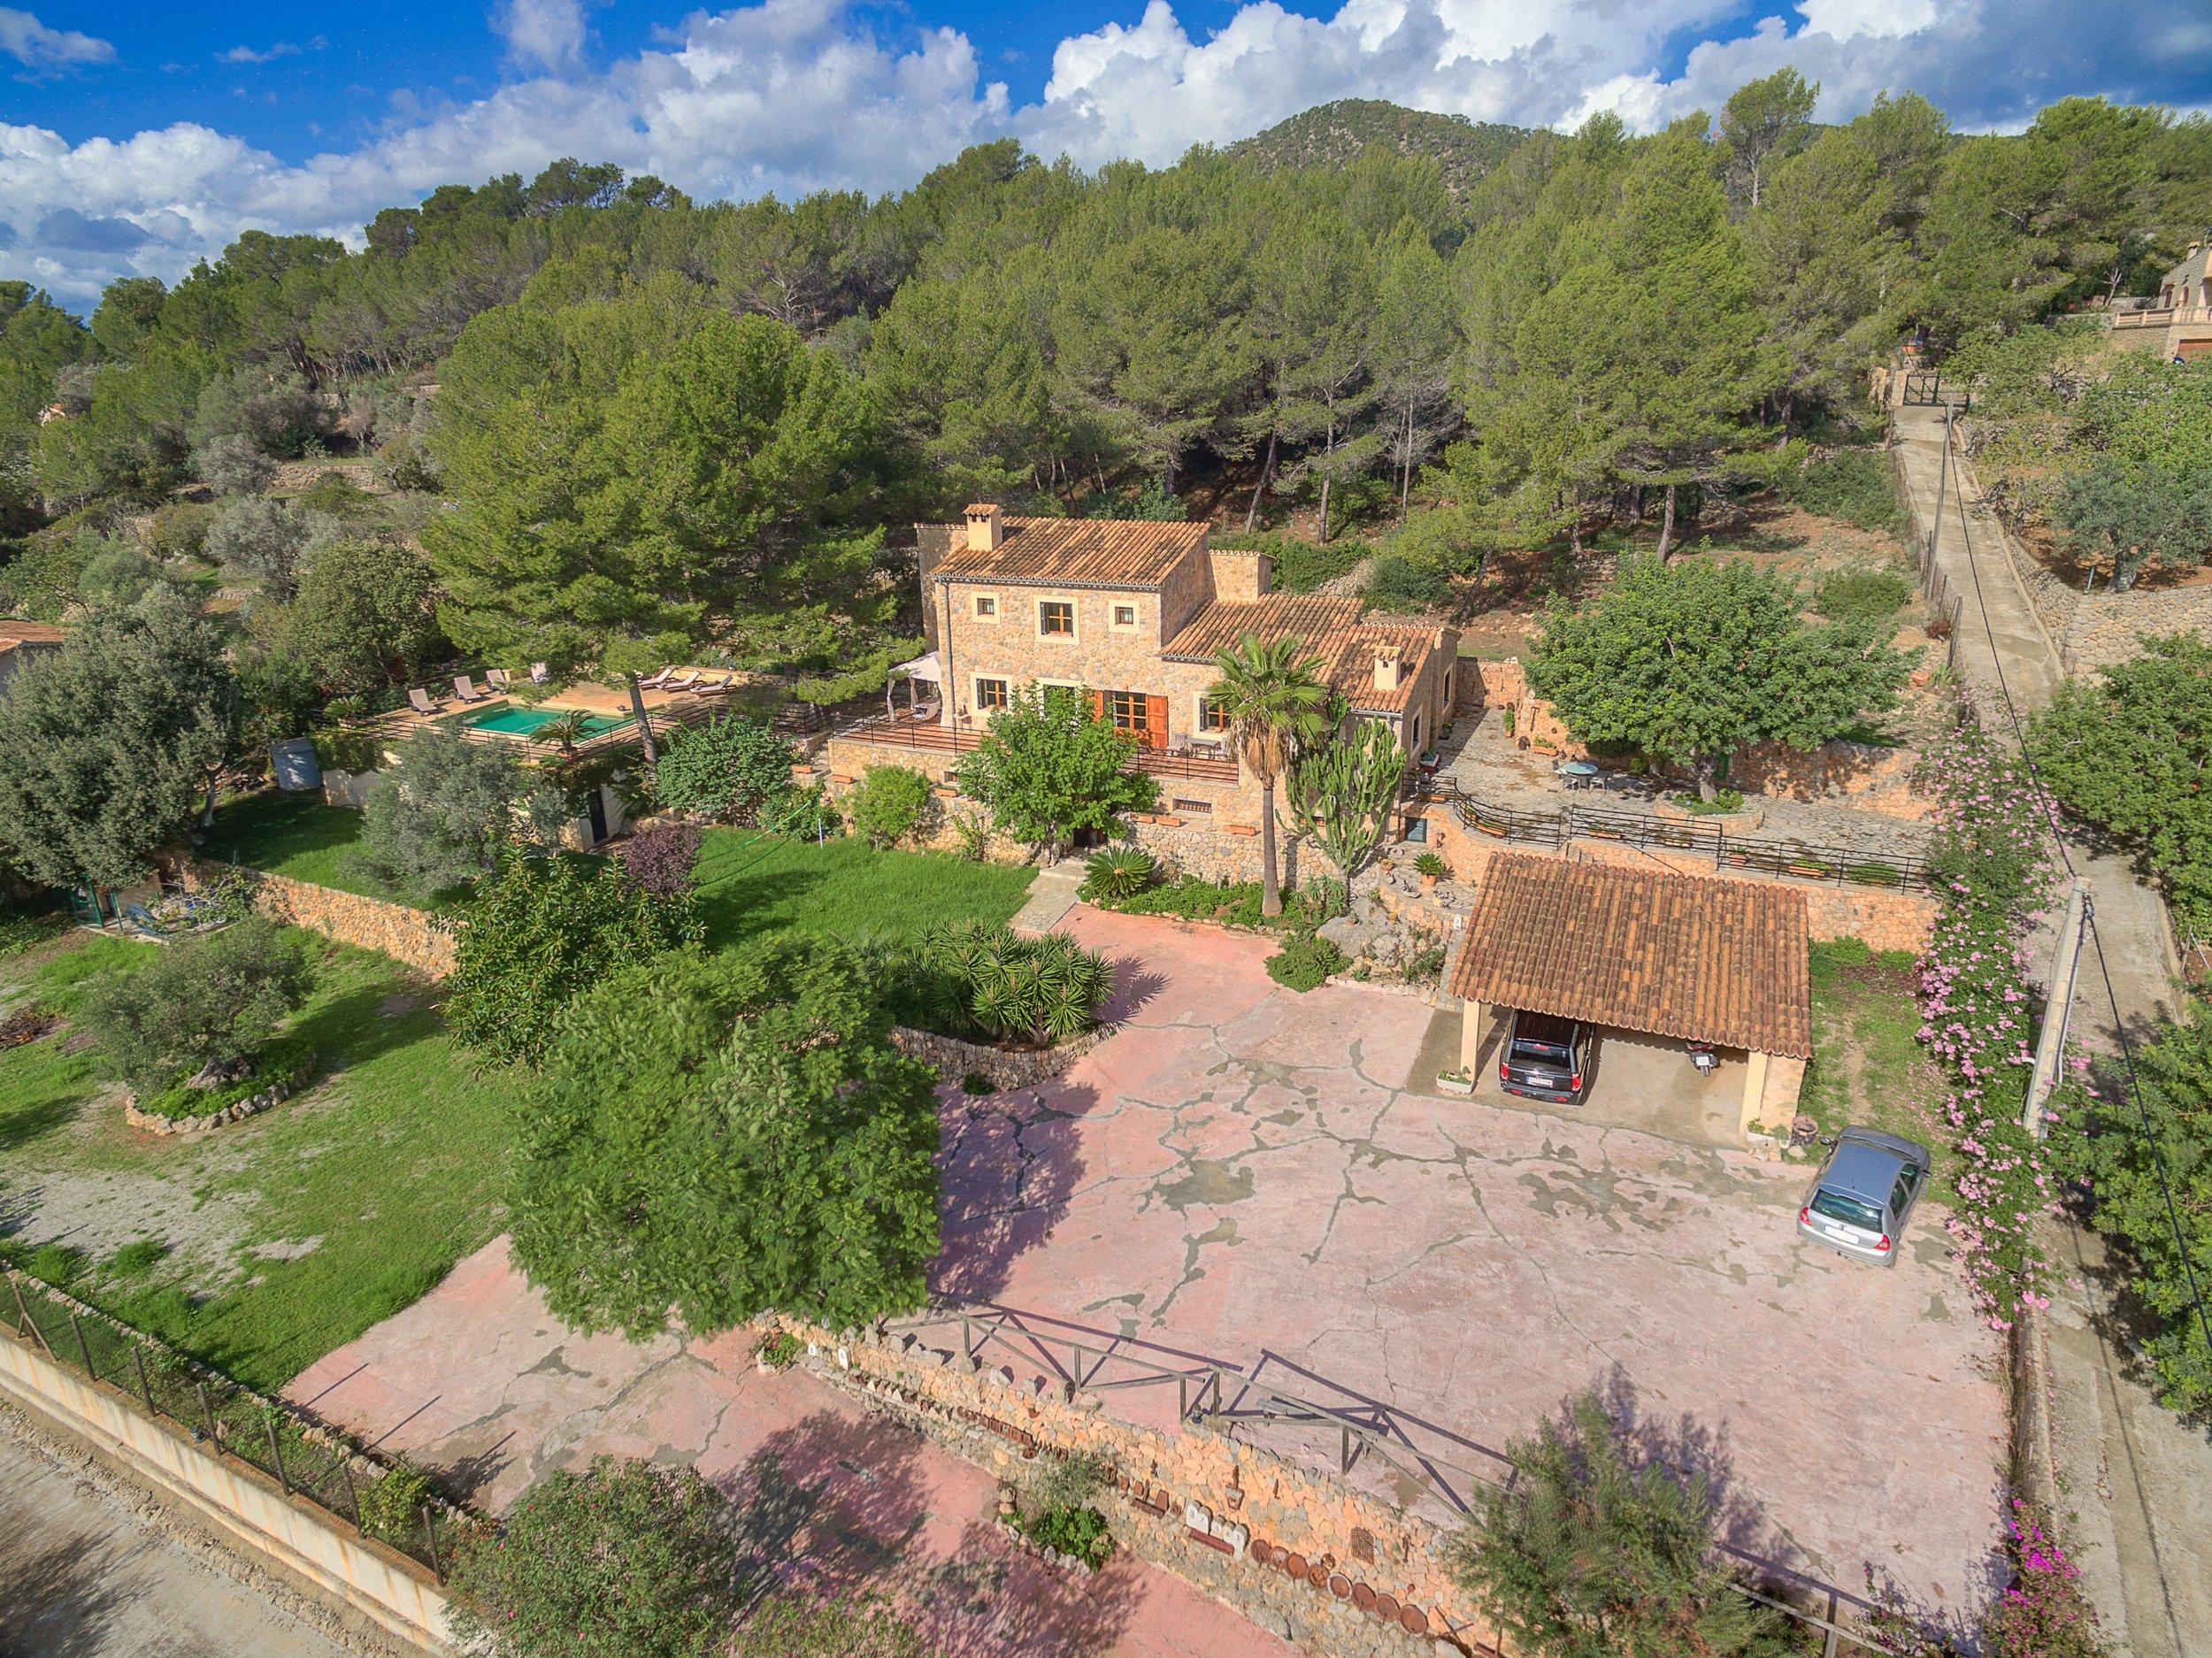 Maison de vacances Villa Cirera in Alaro (2611793), Alaro, Majorque, Iles Baléares, Espagne, image 28